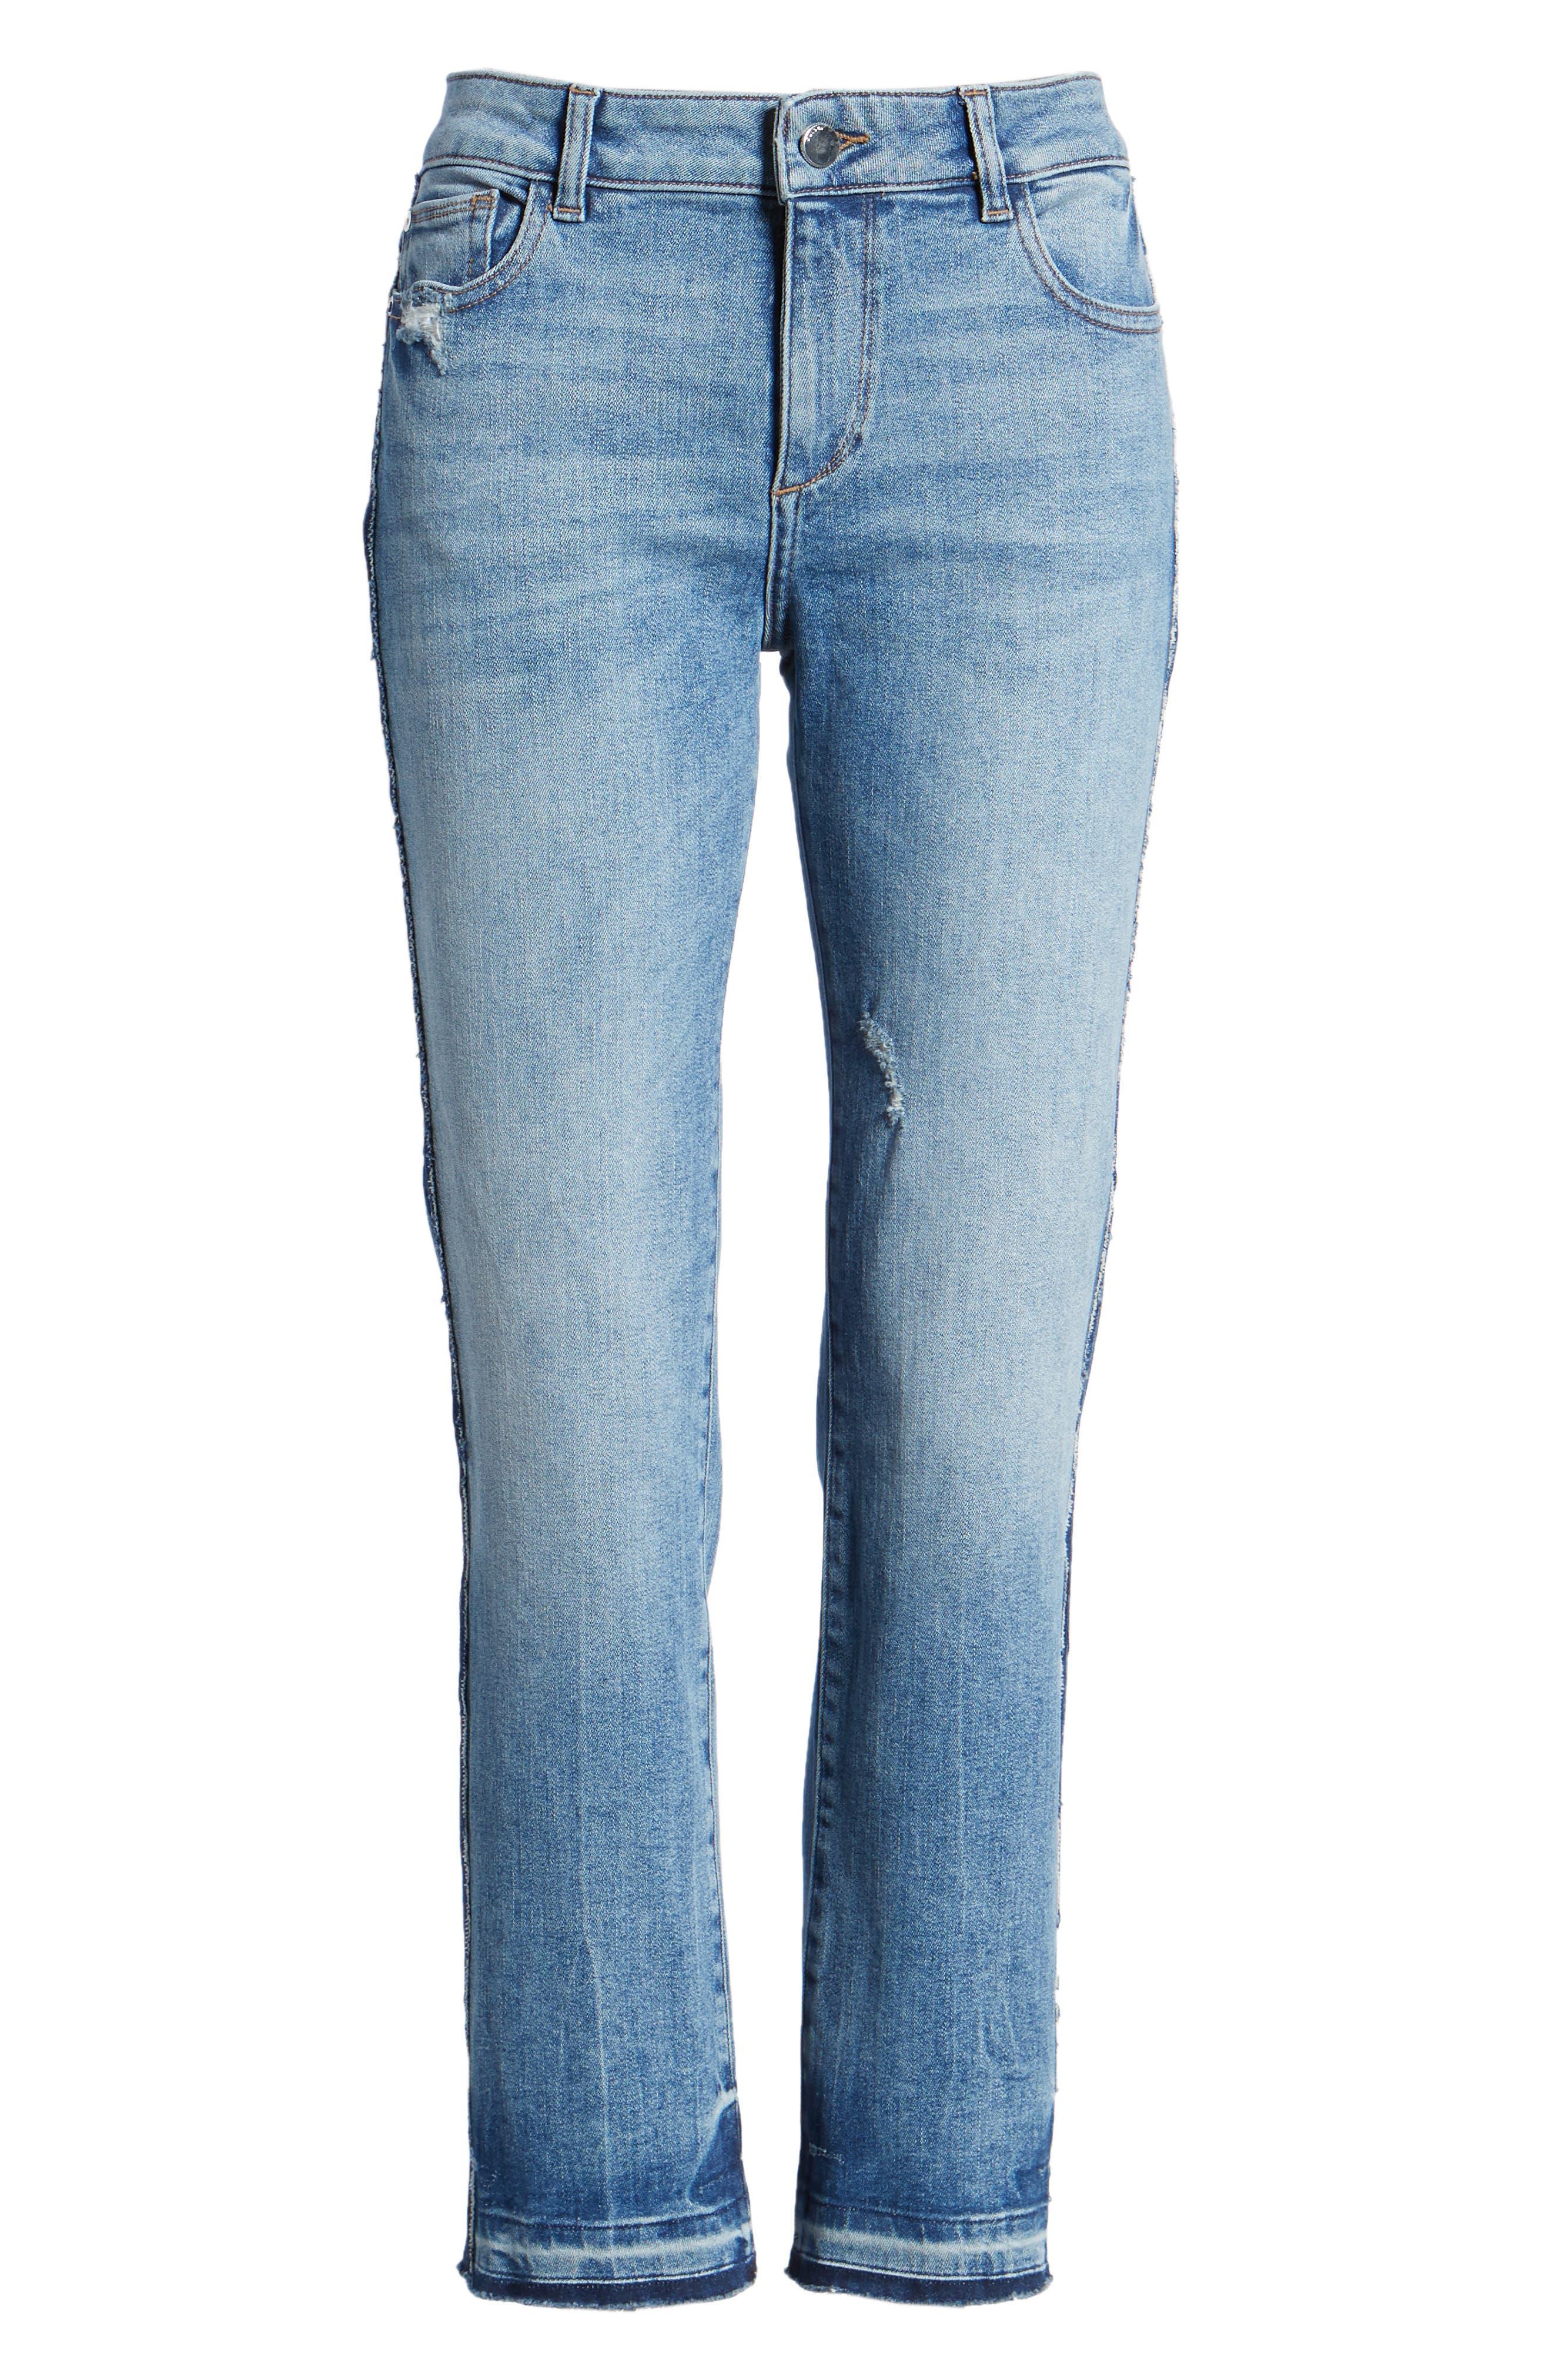 Mara Instasculpt Ankle Straight Leg Jeans,                             Alternate thumbnail 7, color,                             425